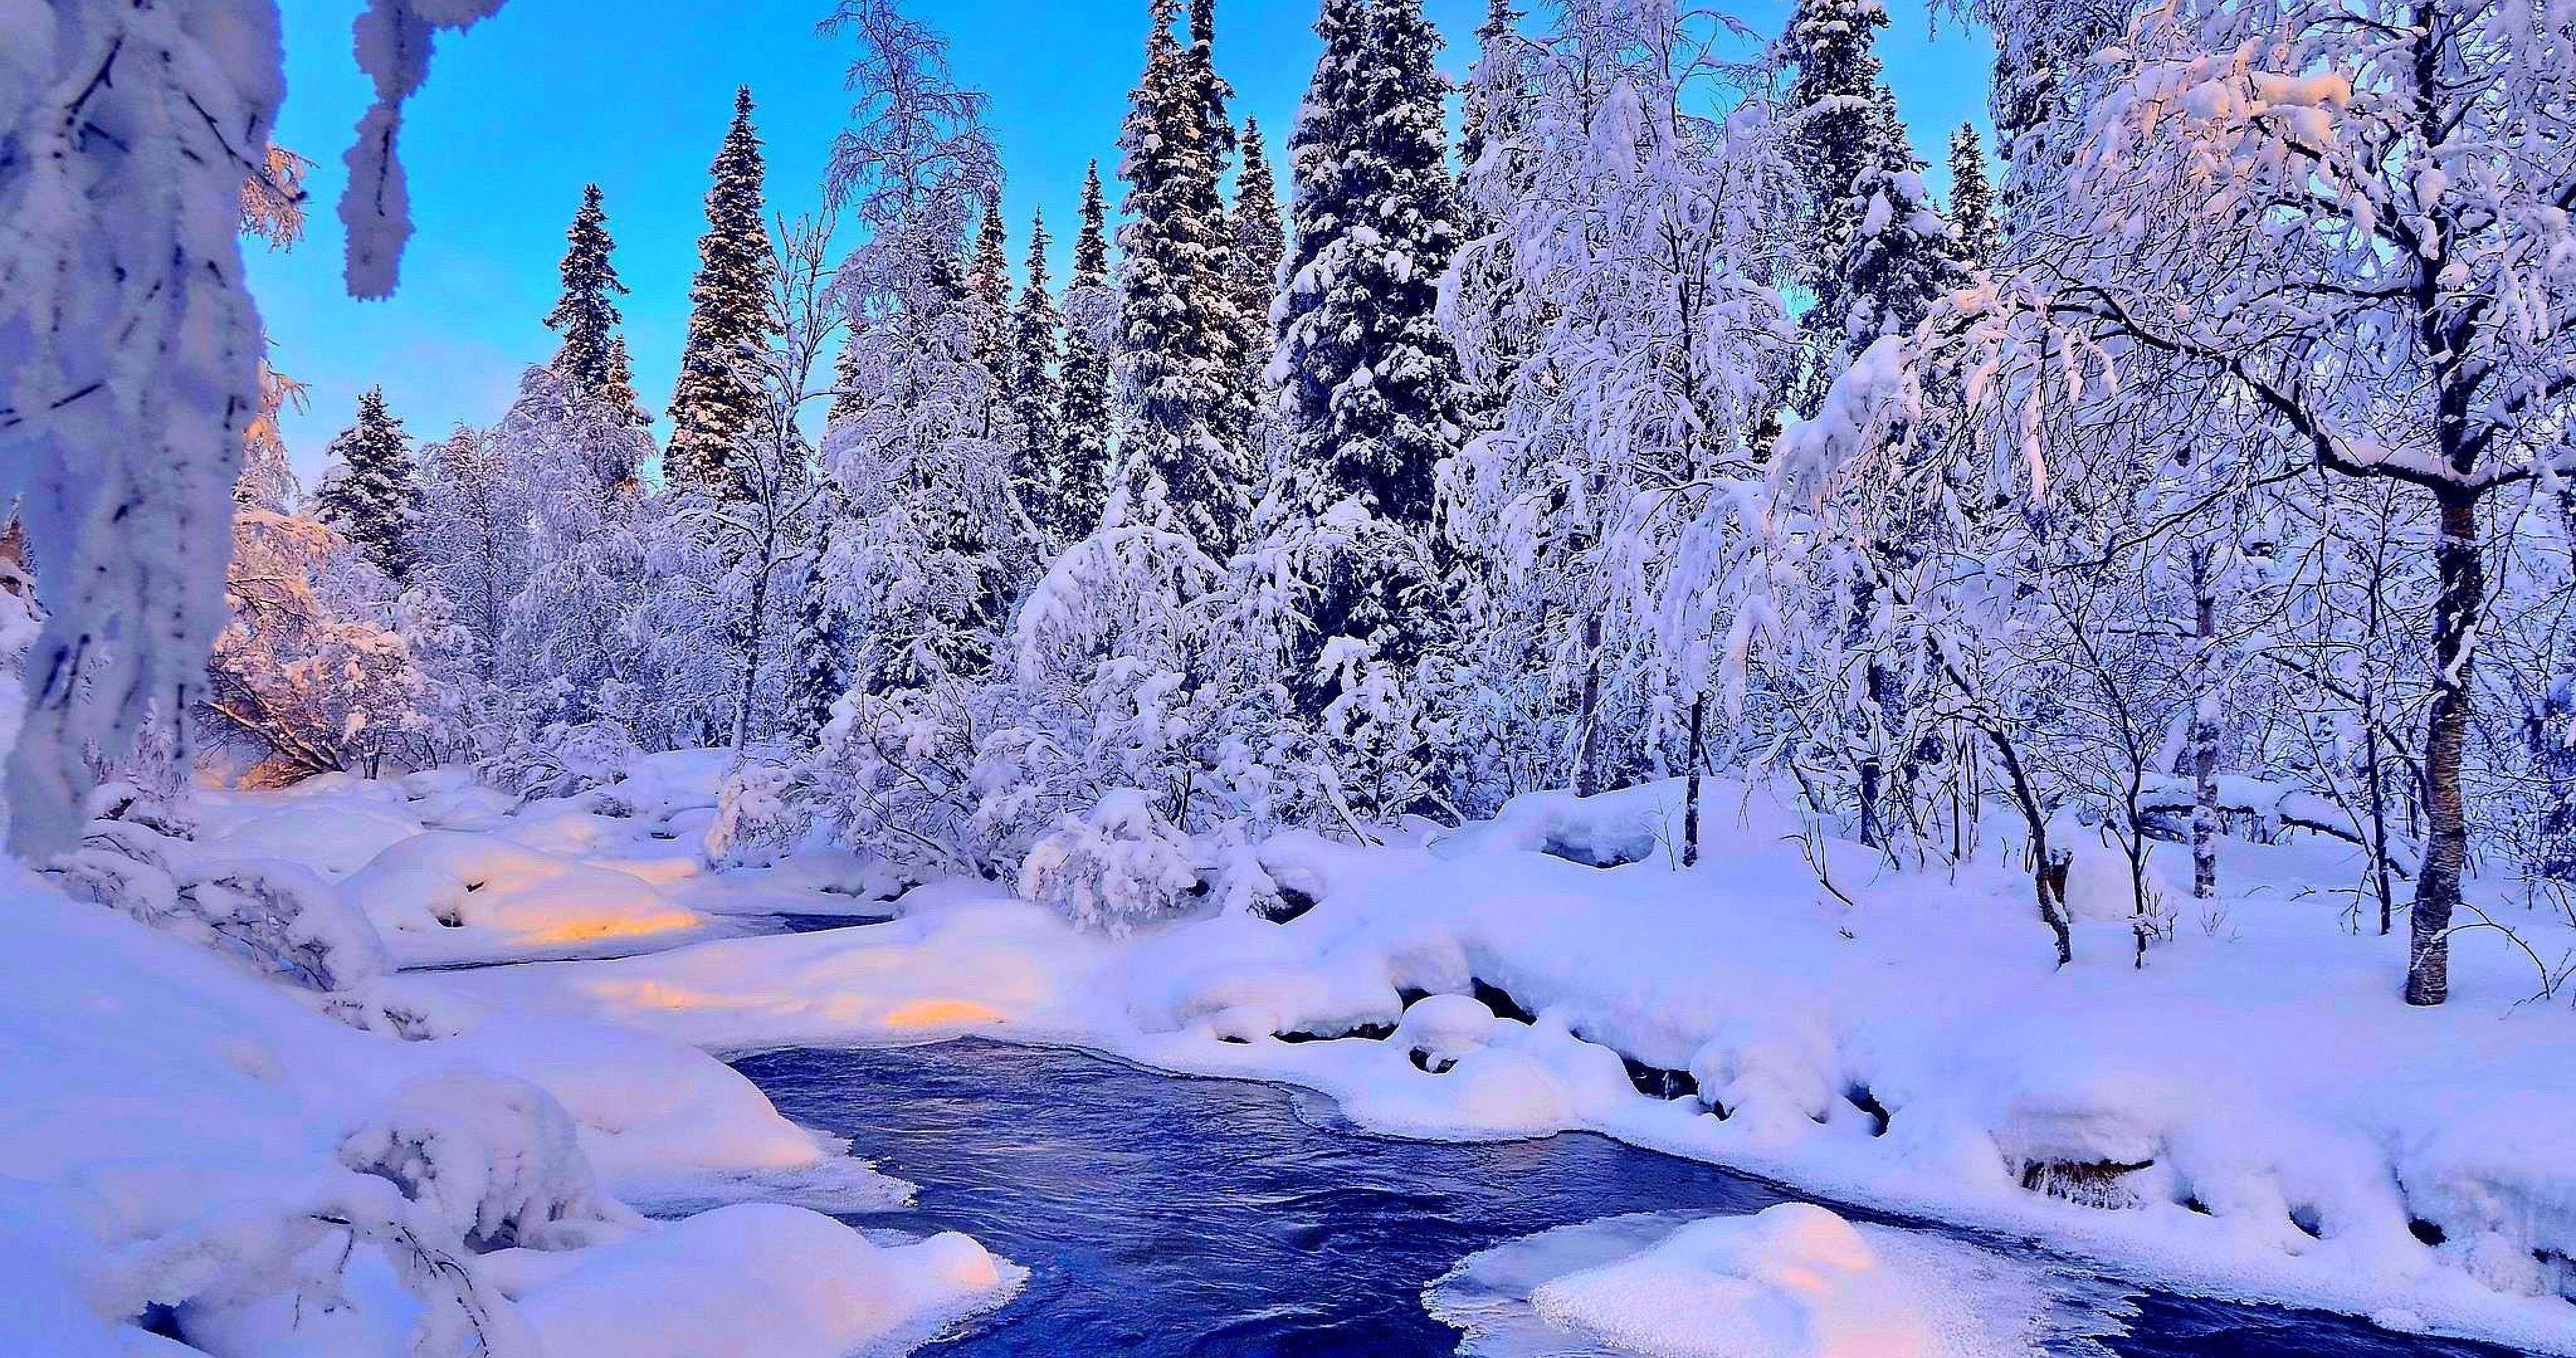 river in winter 4k ultra hd wallpaper ololoshenka Tree